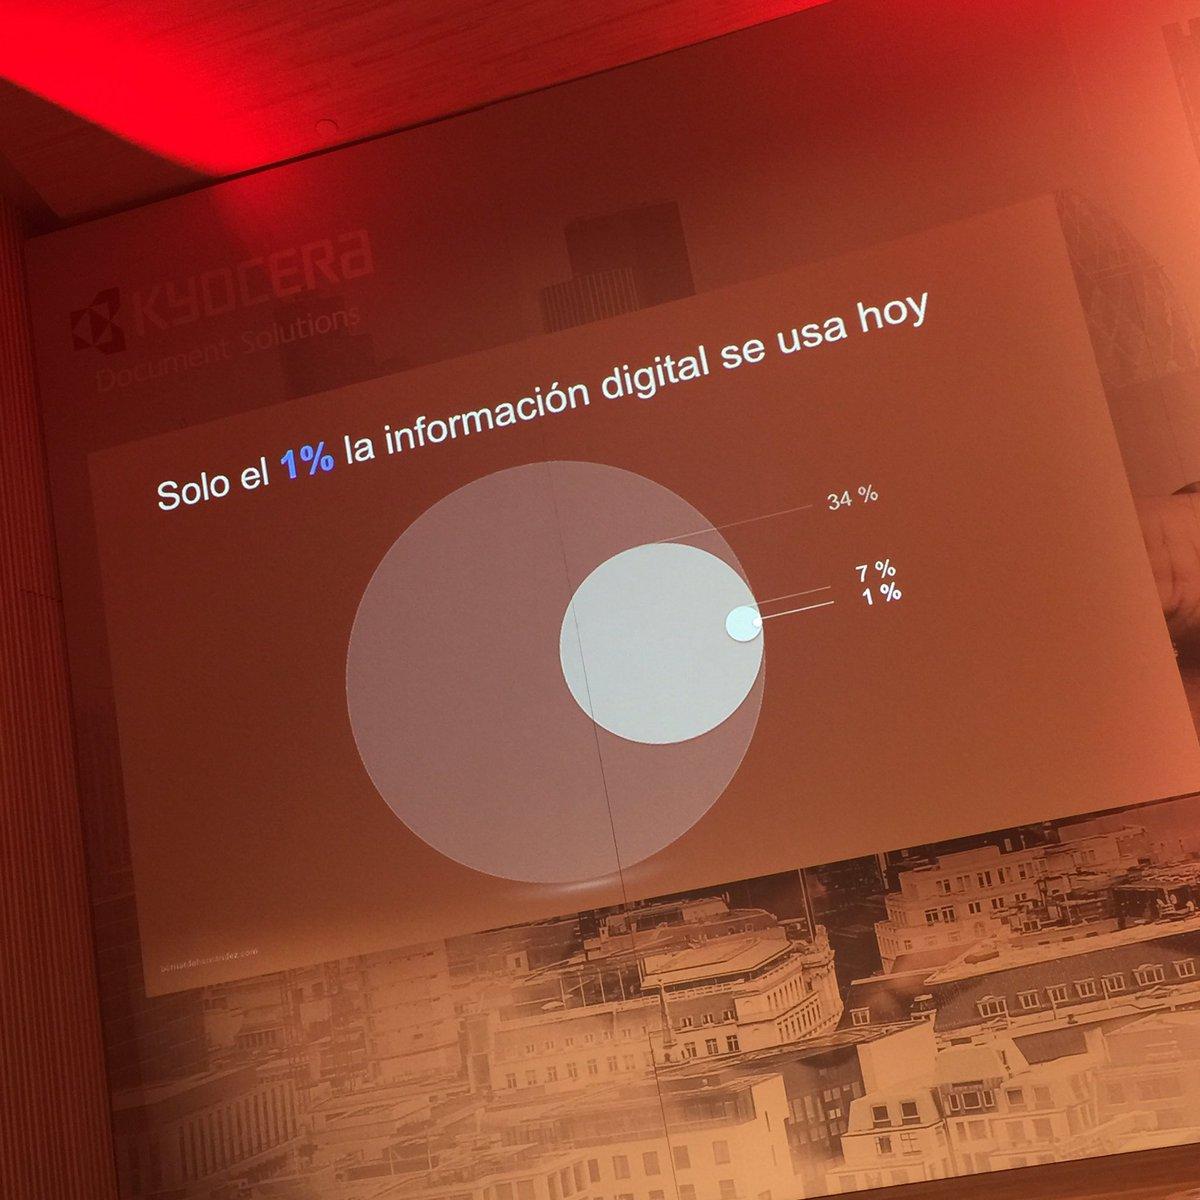 Impresionante dato que nos trae @BernieHernie #SmarterWorkspaces #BigData #tecnología https://t.co/HdEK5sE0cR